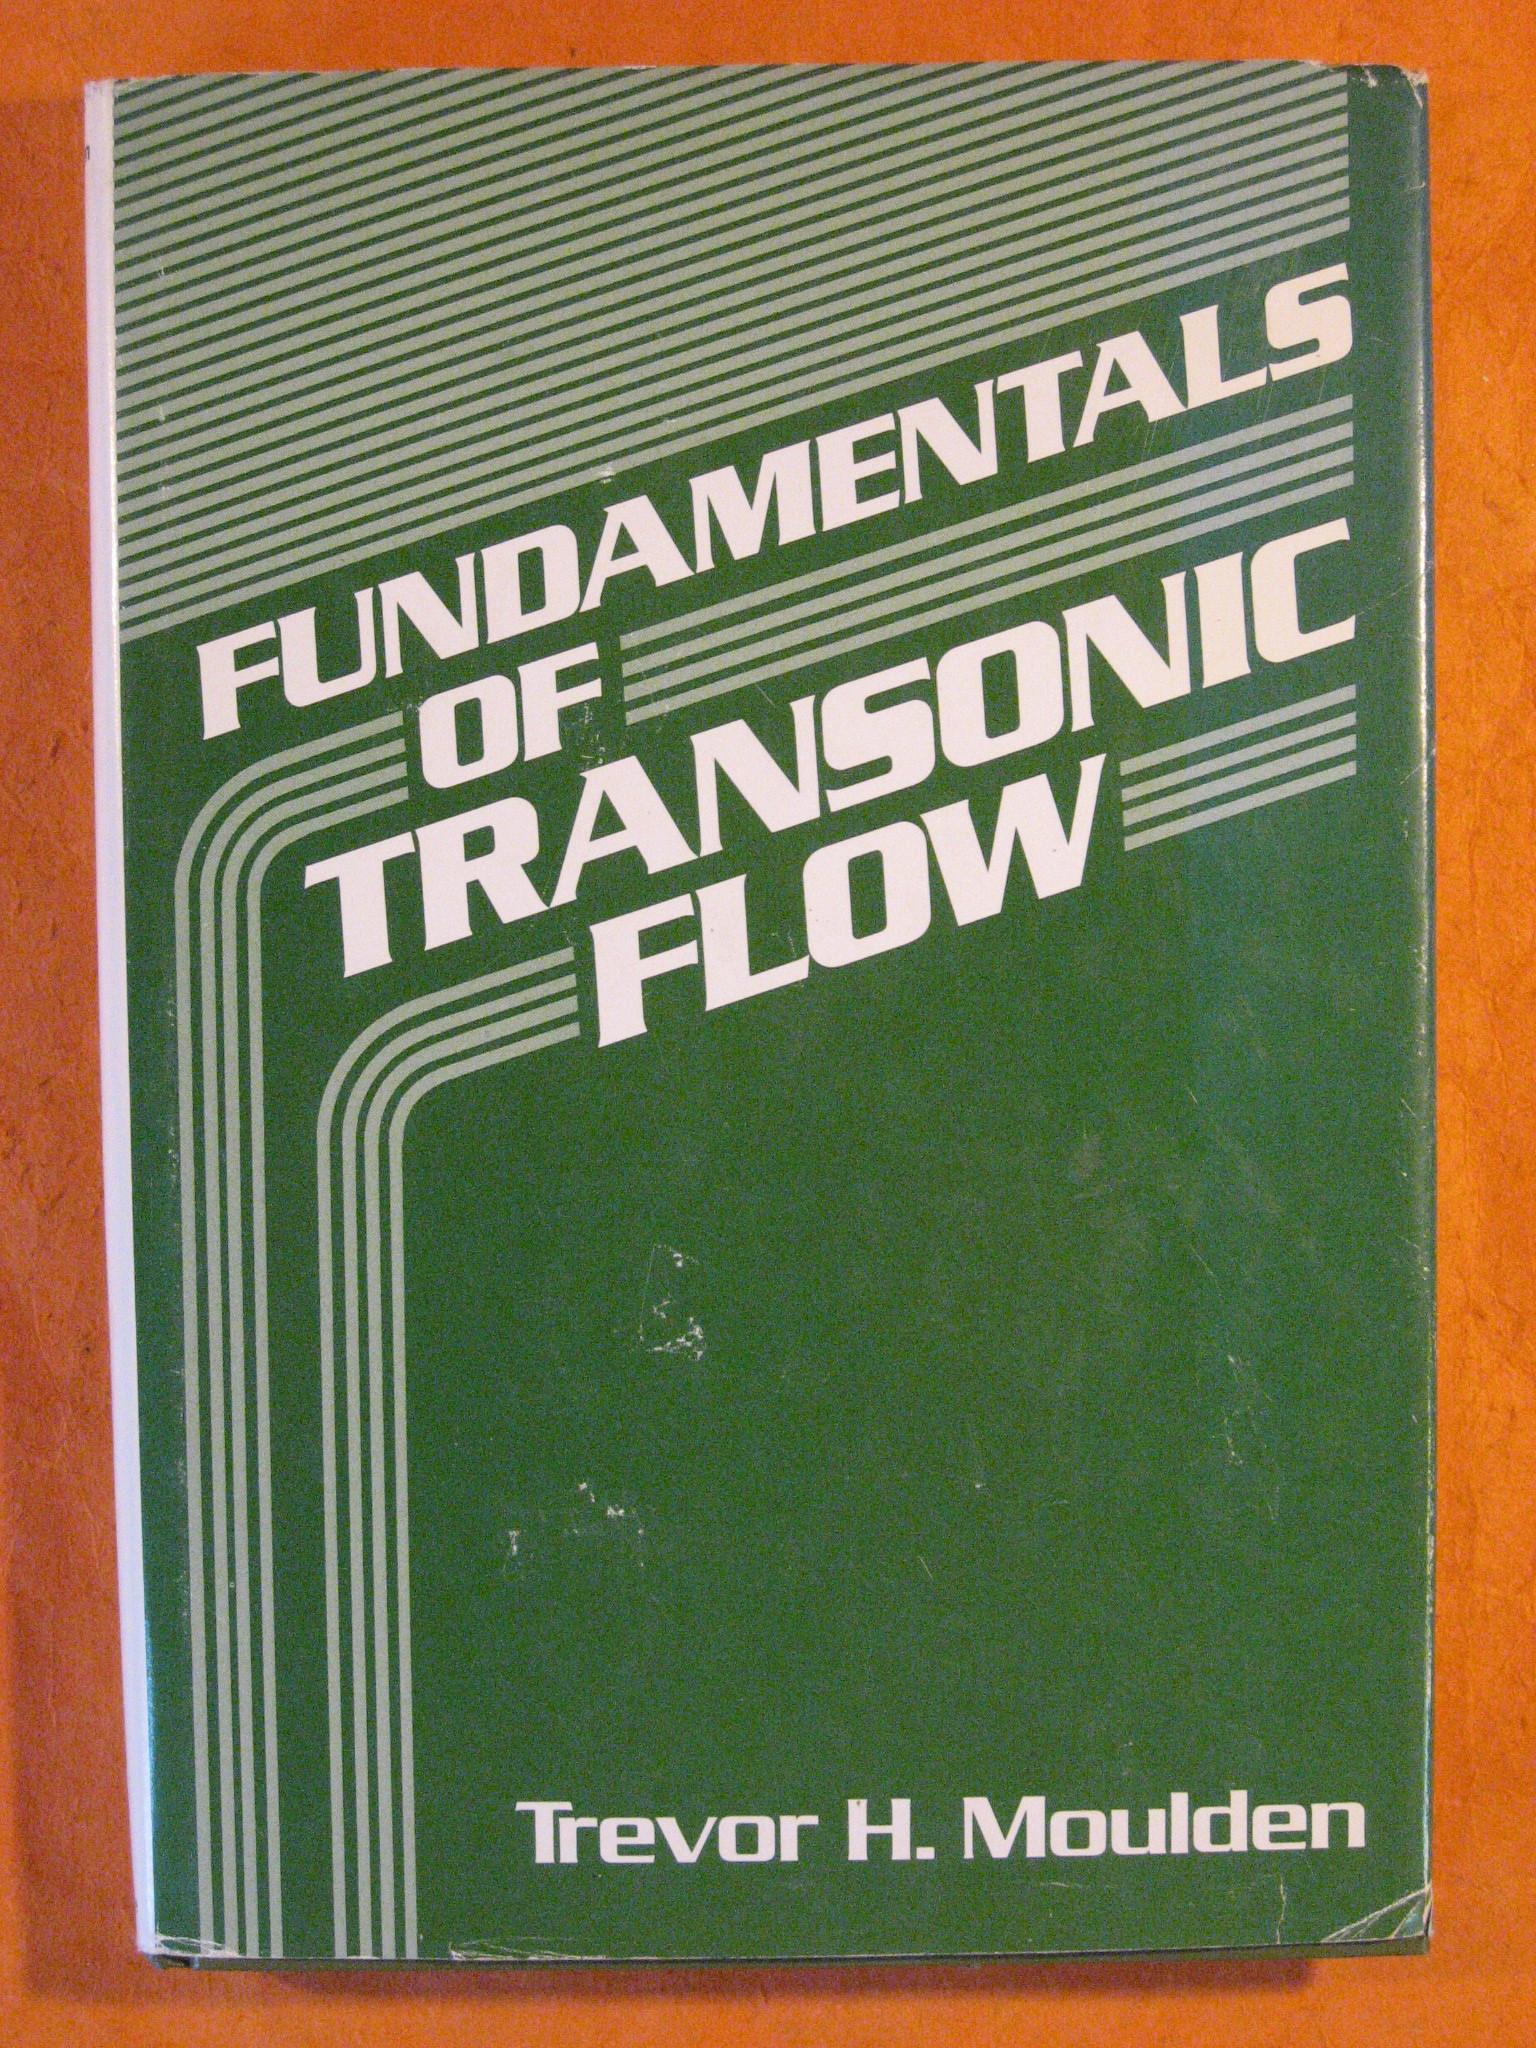 Fundamentals of Transonic Flow, T. H. Moulden